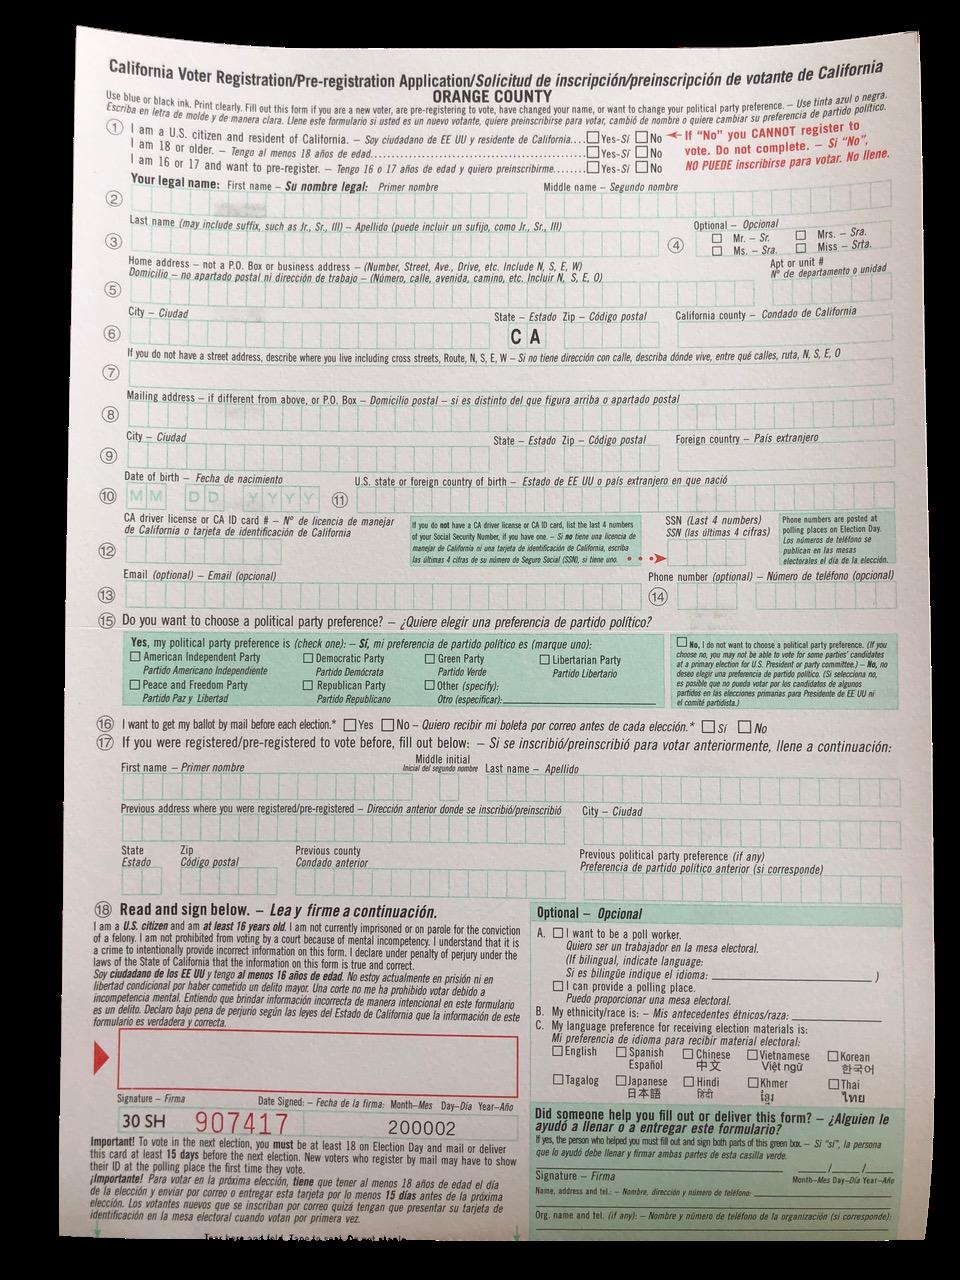 CA_Voter_Form 2.png